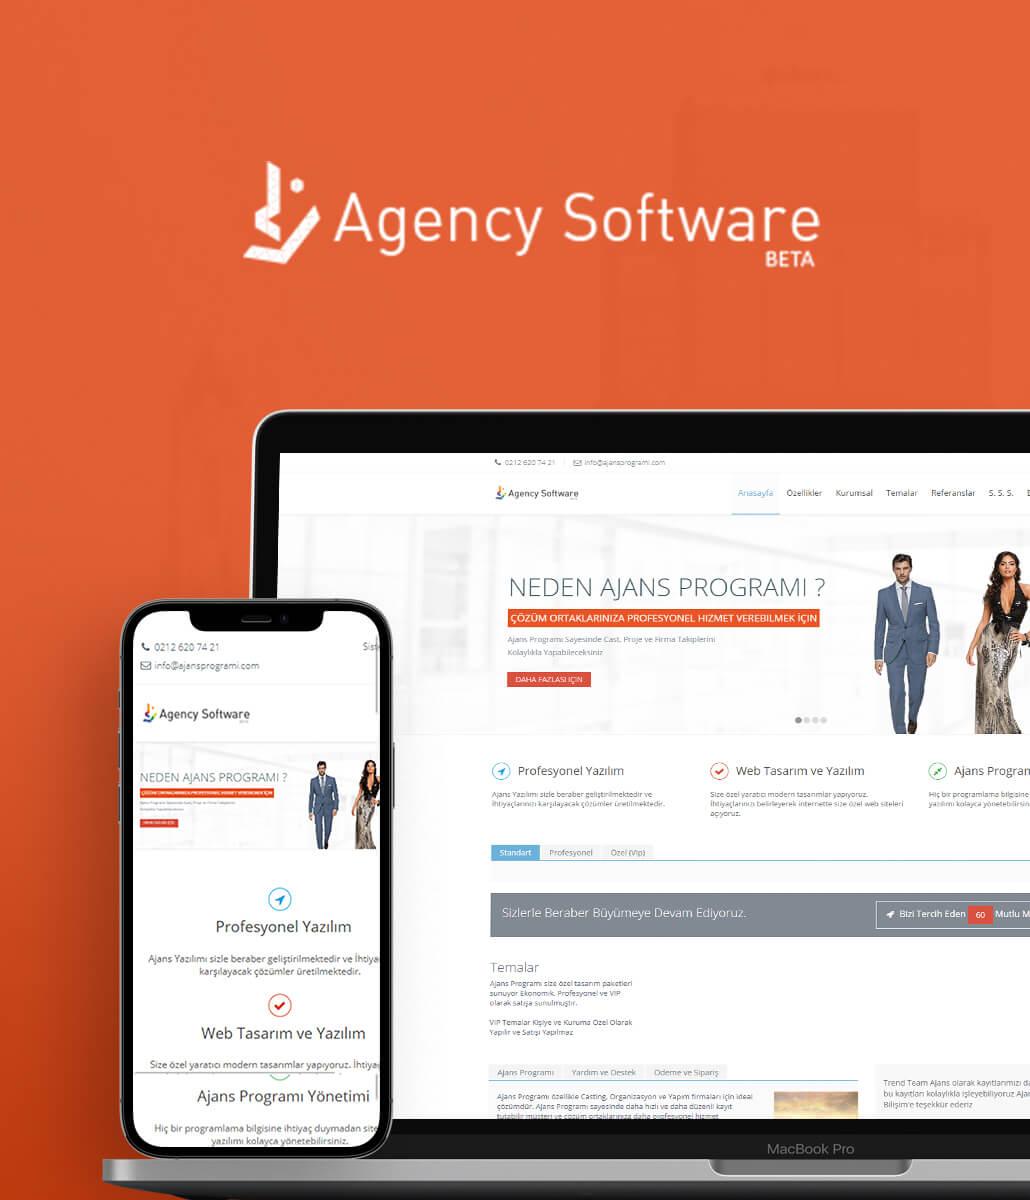 Agency Software Kurumsal Web Tasarımı